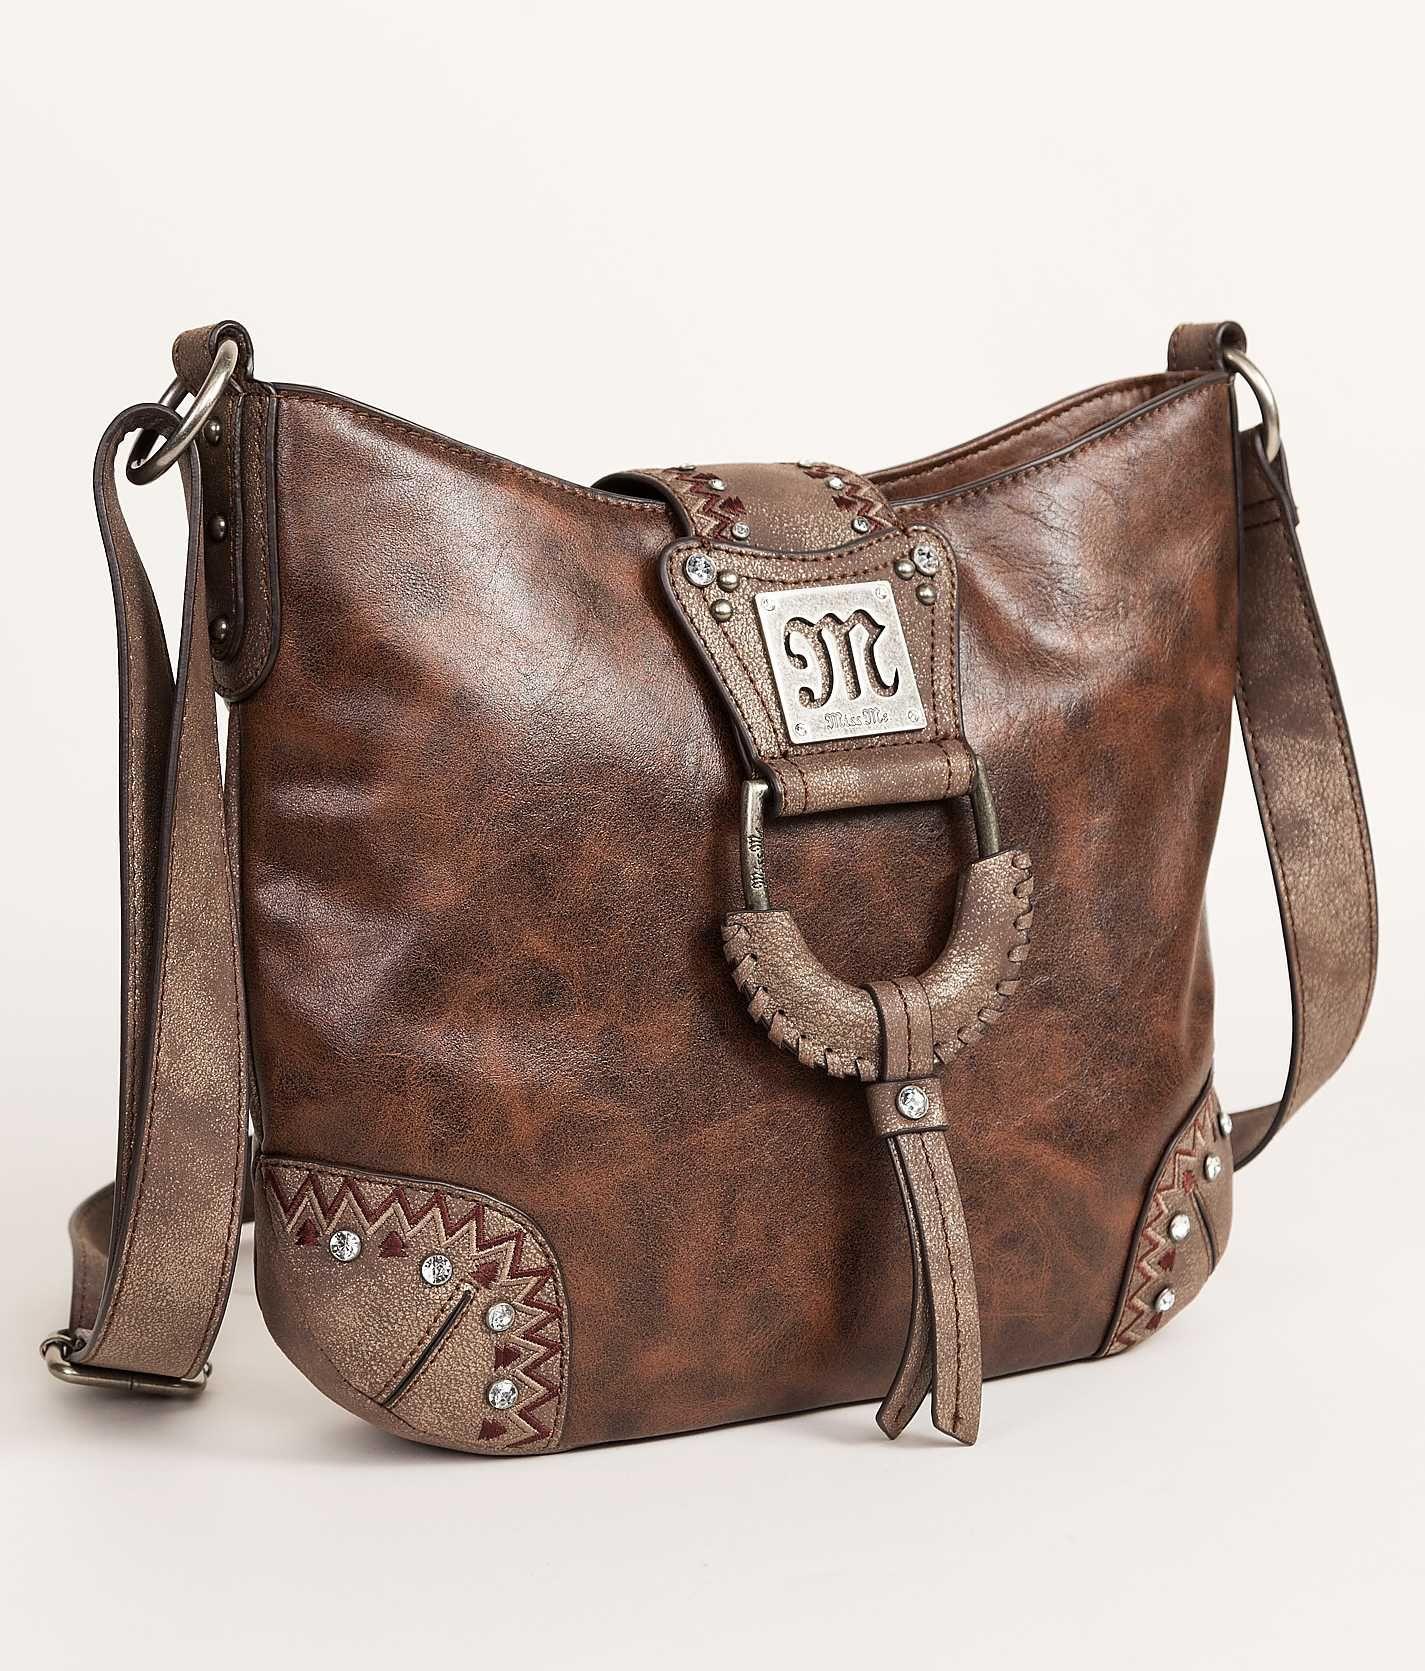 Miss Me Metallic Crossbody Purse - Women's Bags | Buckle